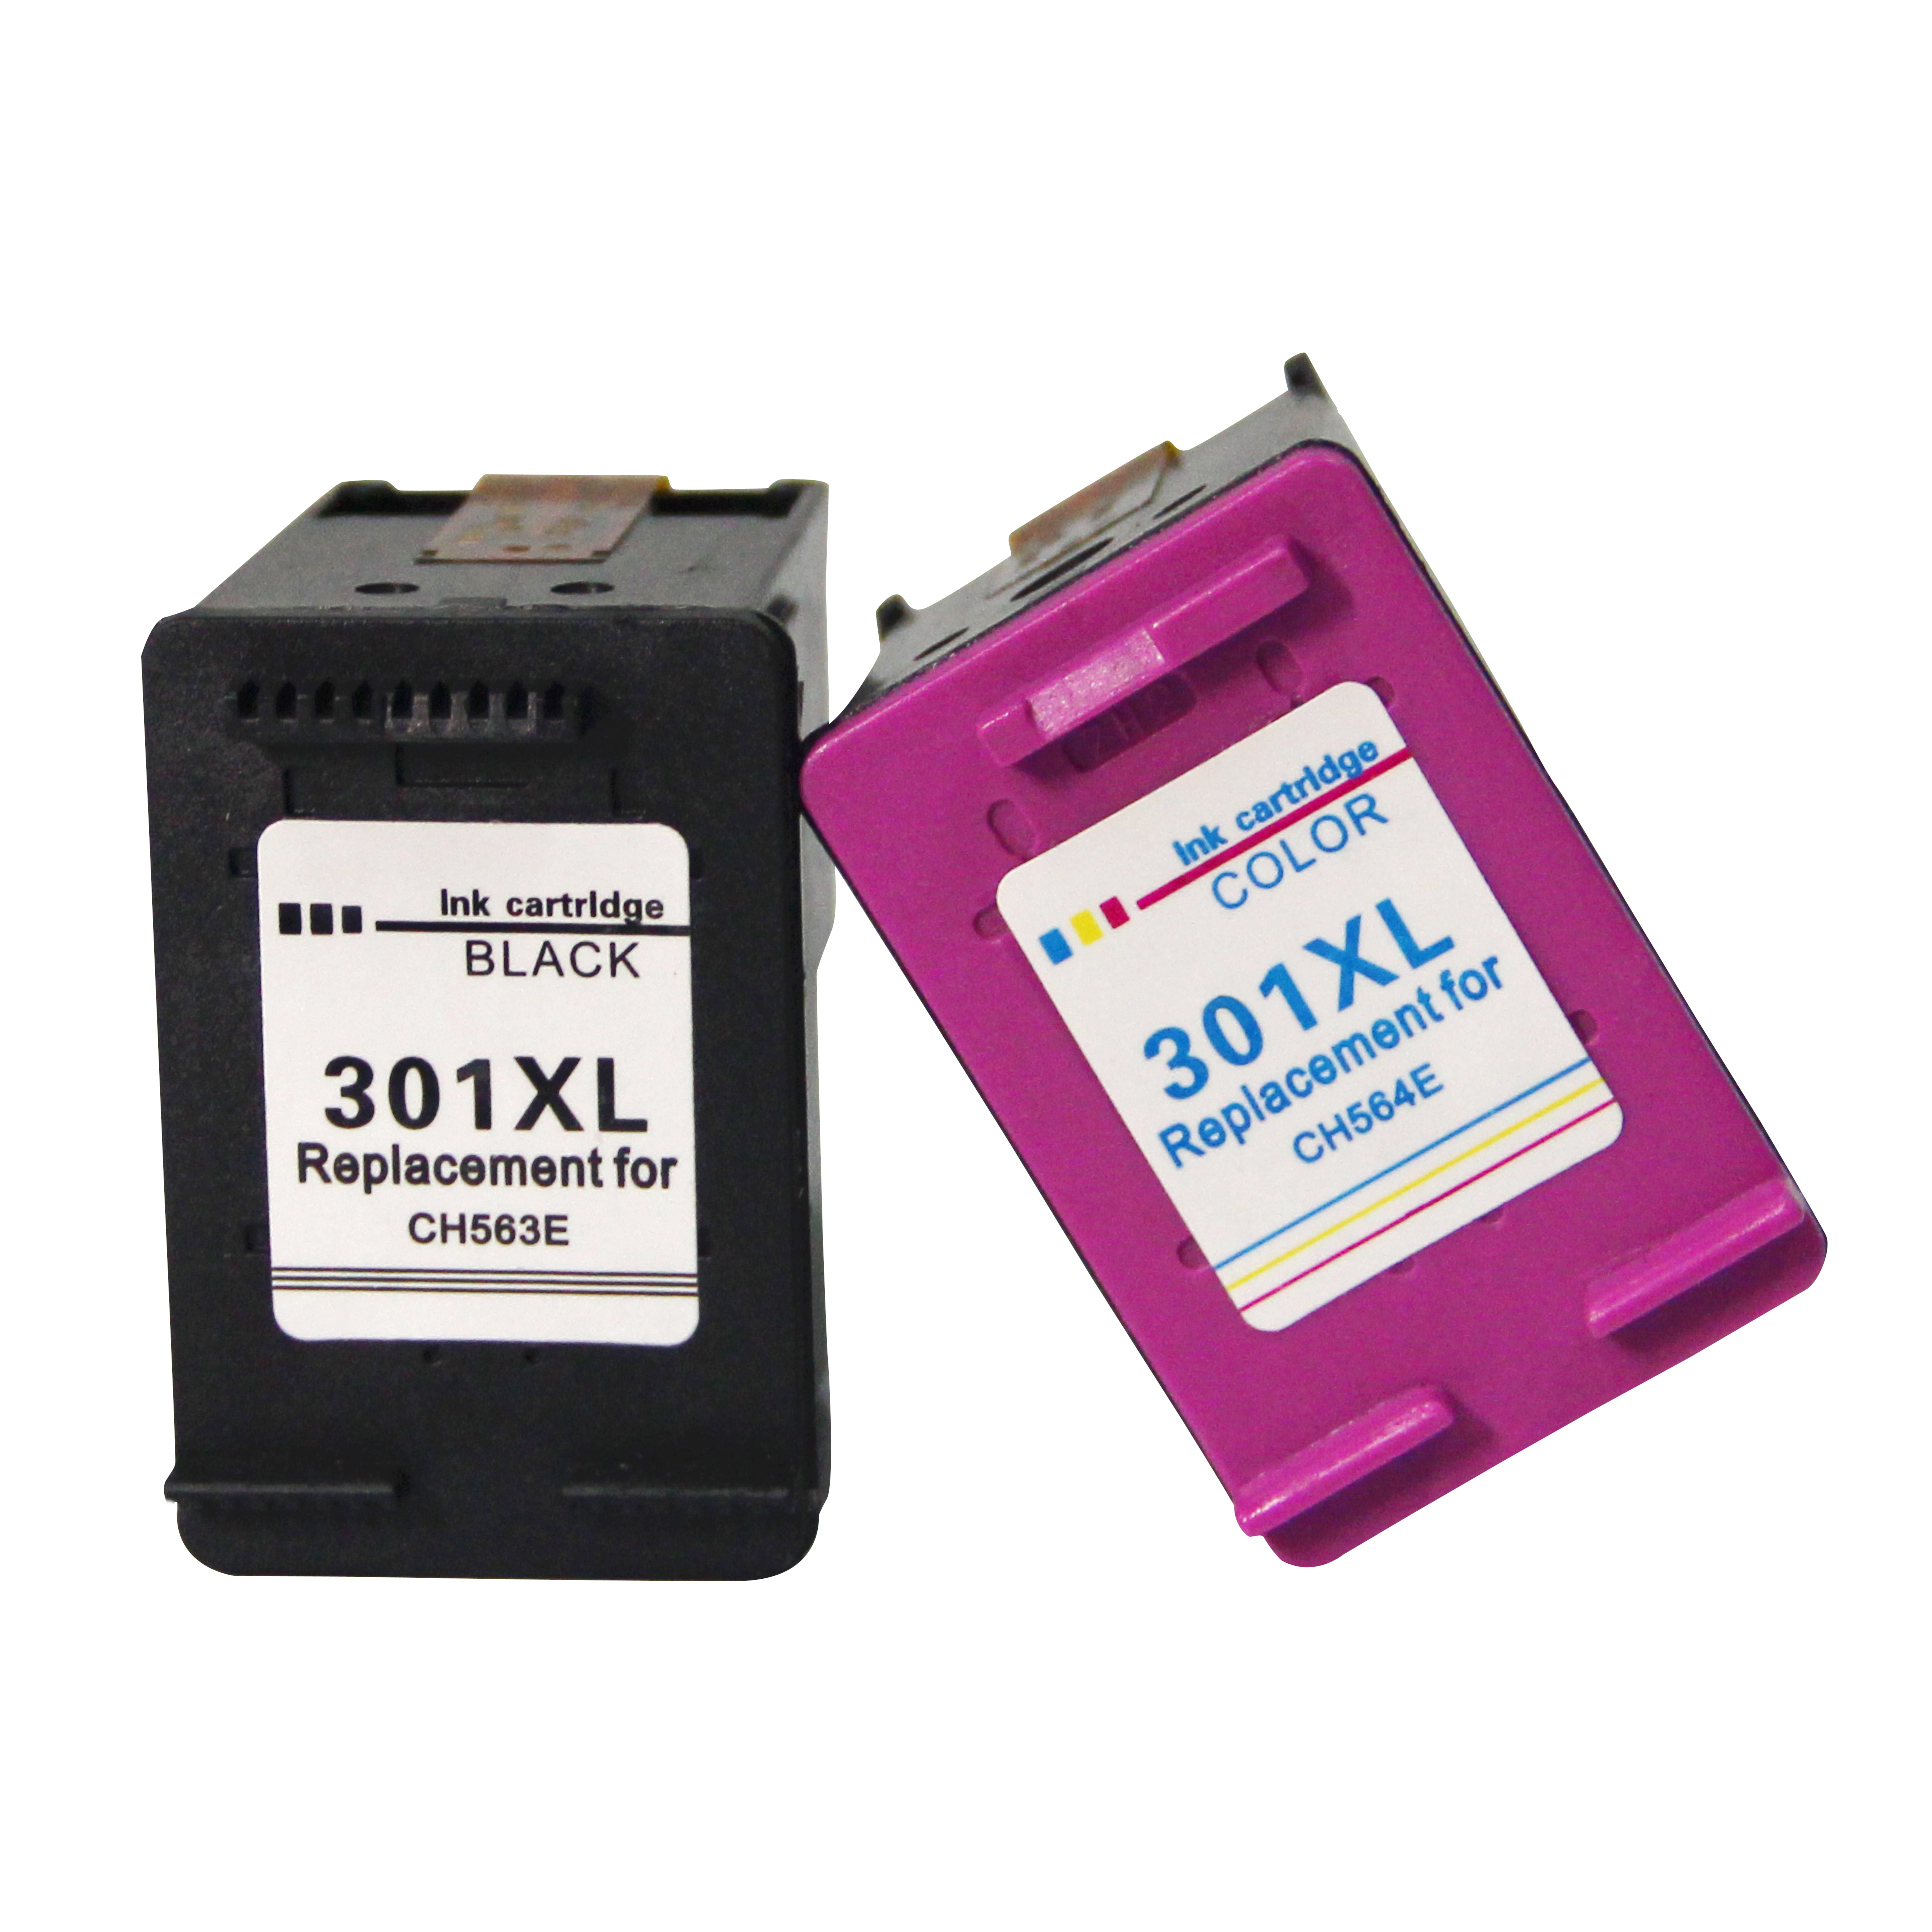 301XL remanufaturados Cartuchos De Tinta para HP 301 para HP Deskjet 1000 1050 2000 2050 2050S 2510 3510 3050 impressoras 3050a